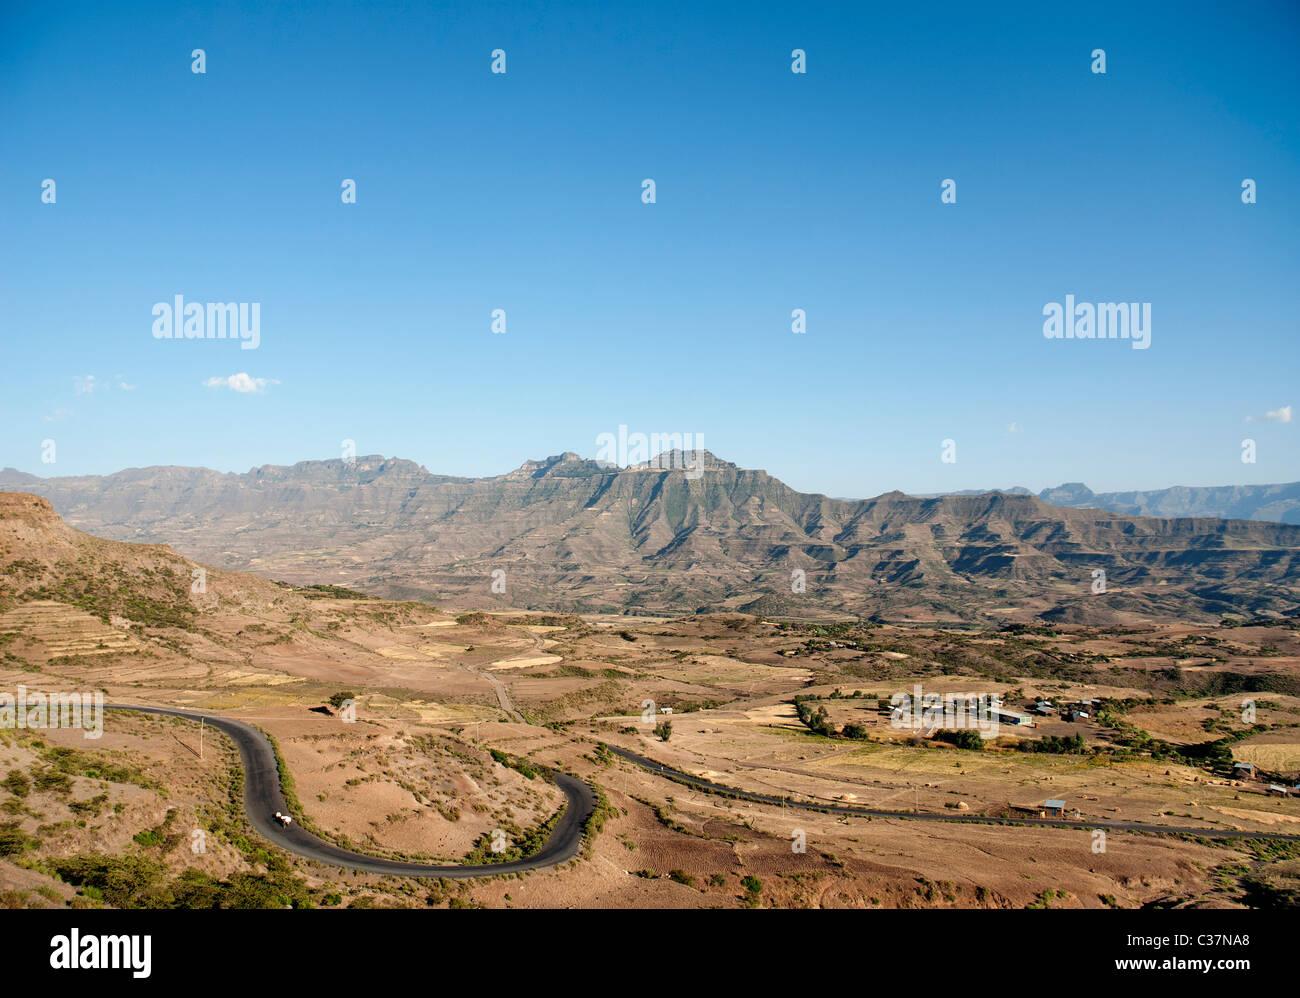 landscape near lalibela in ethiopia - Stock Image